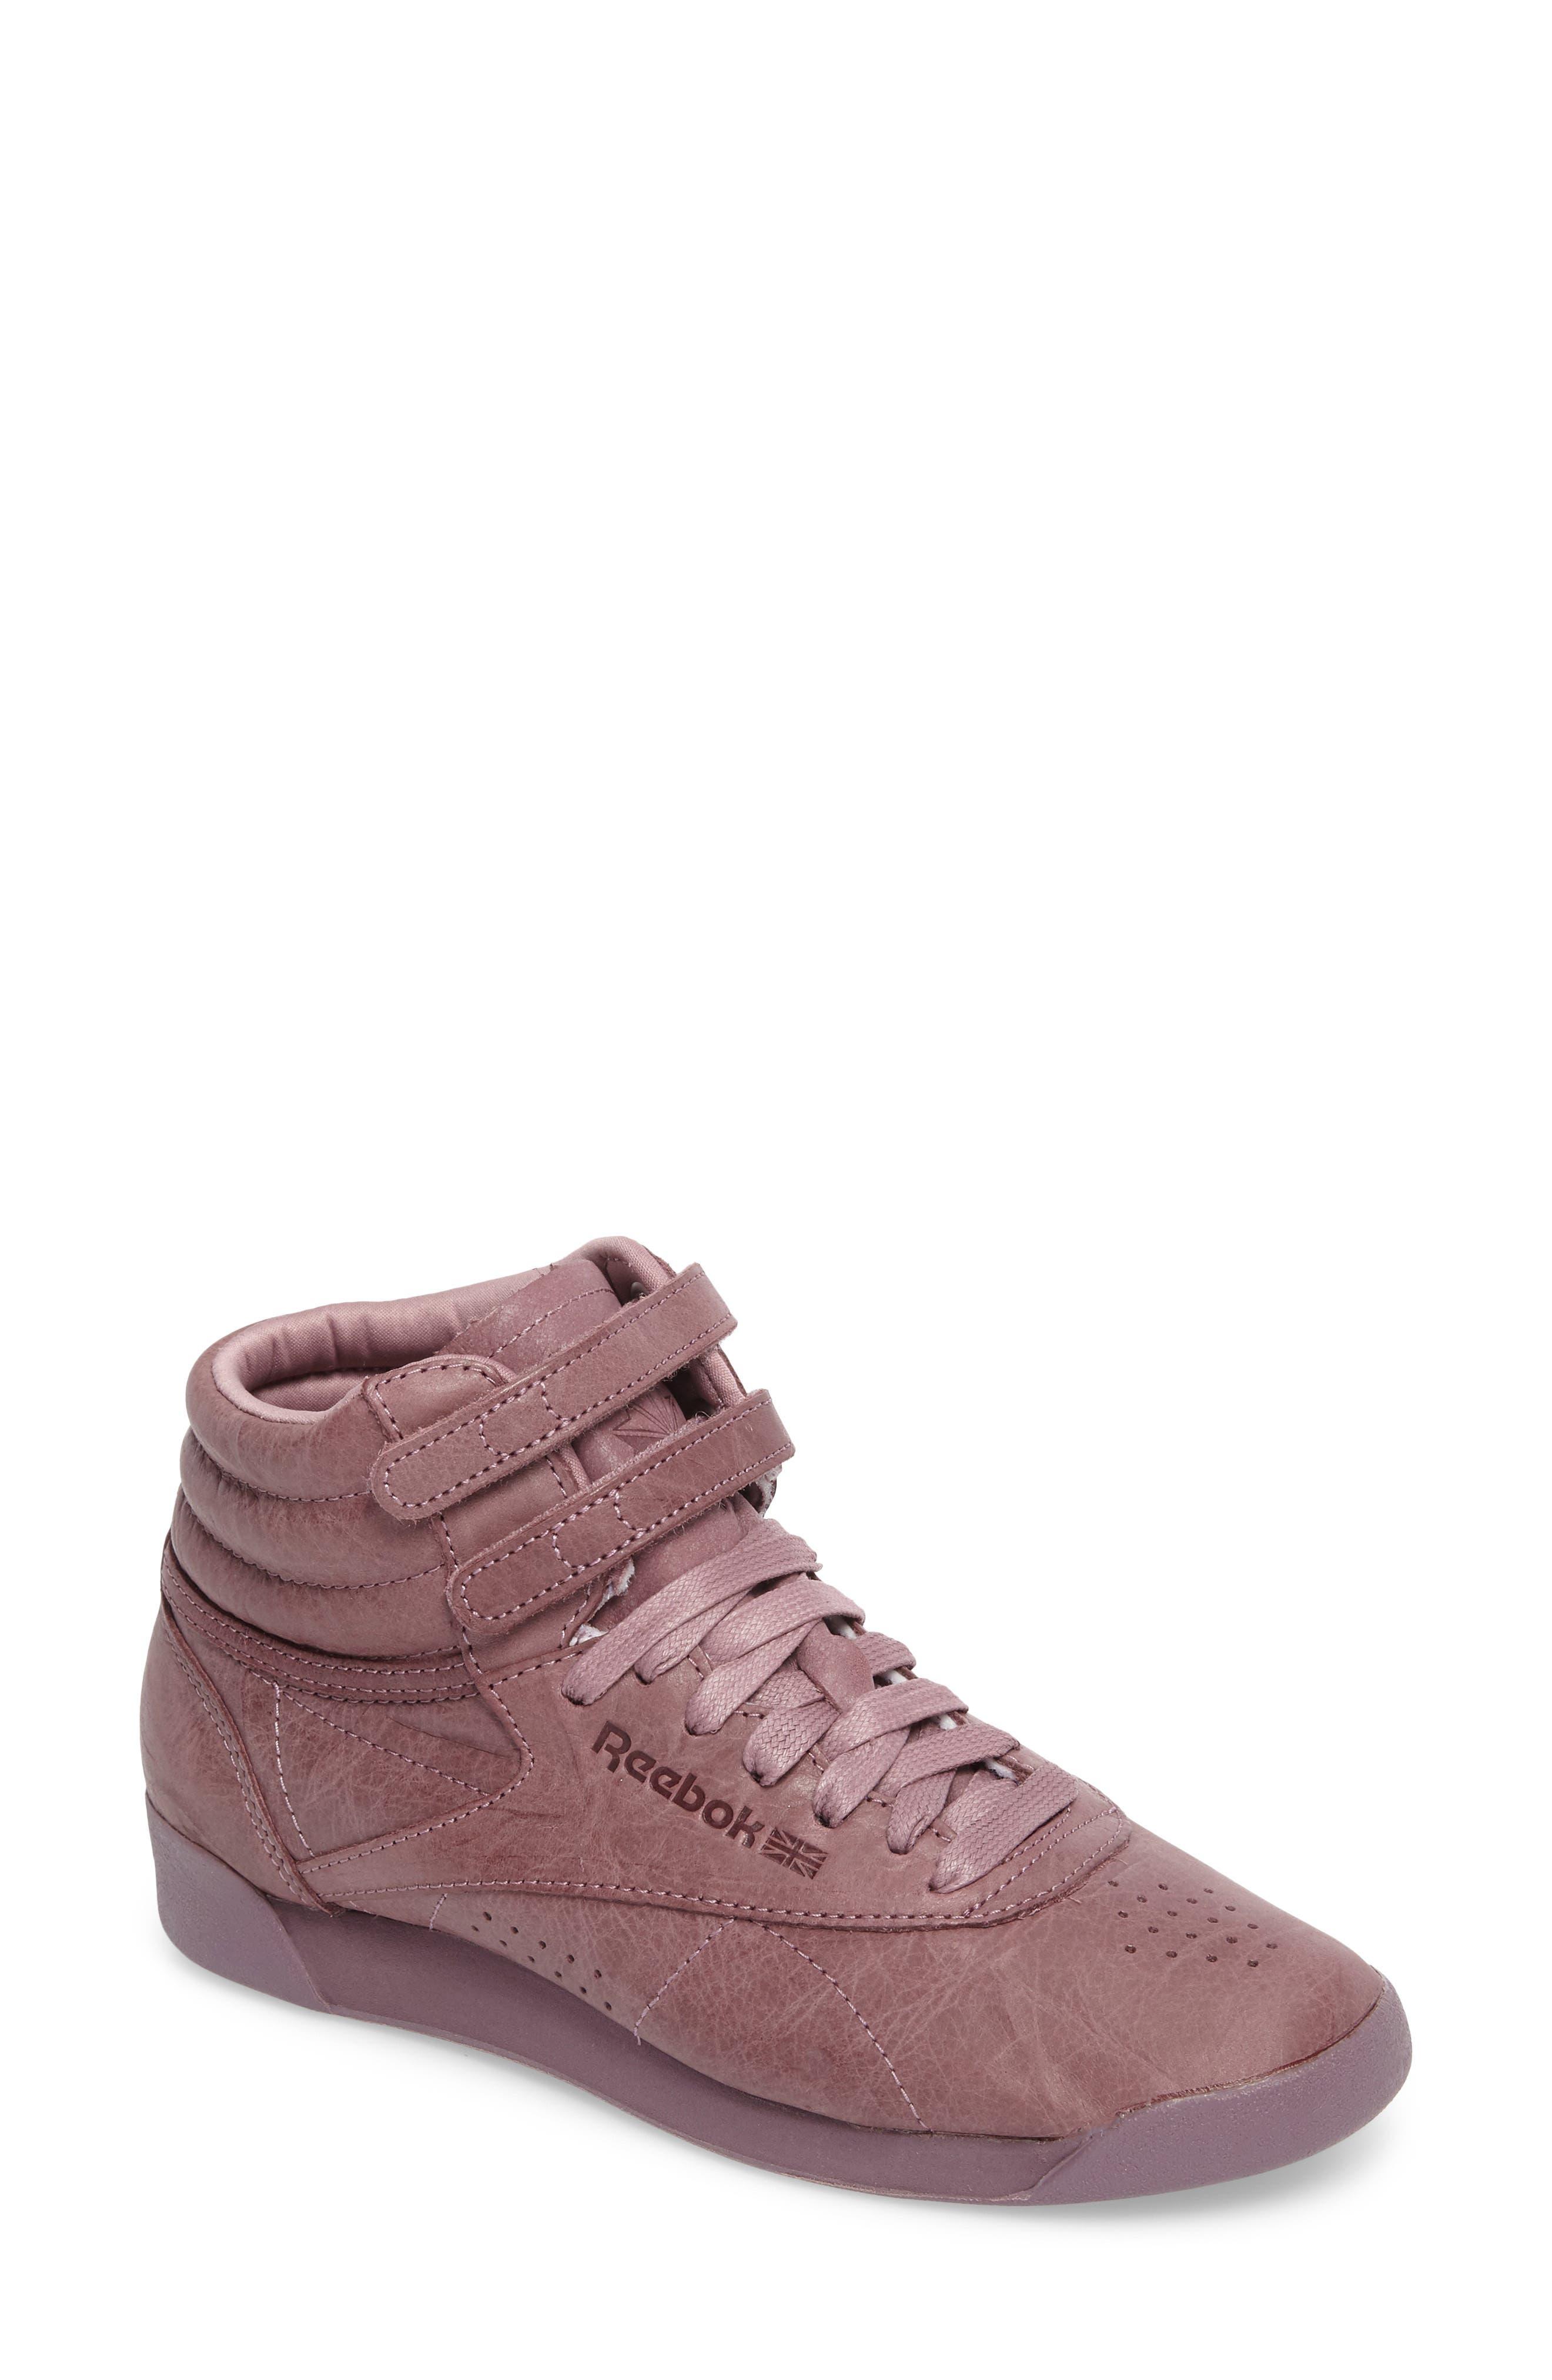 Main Image - Reebok Freestyle Hi Sneaker (Women)